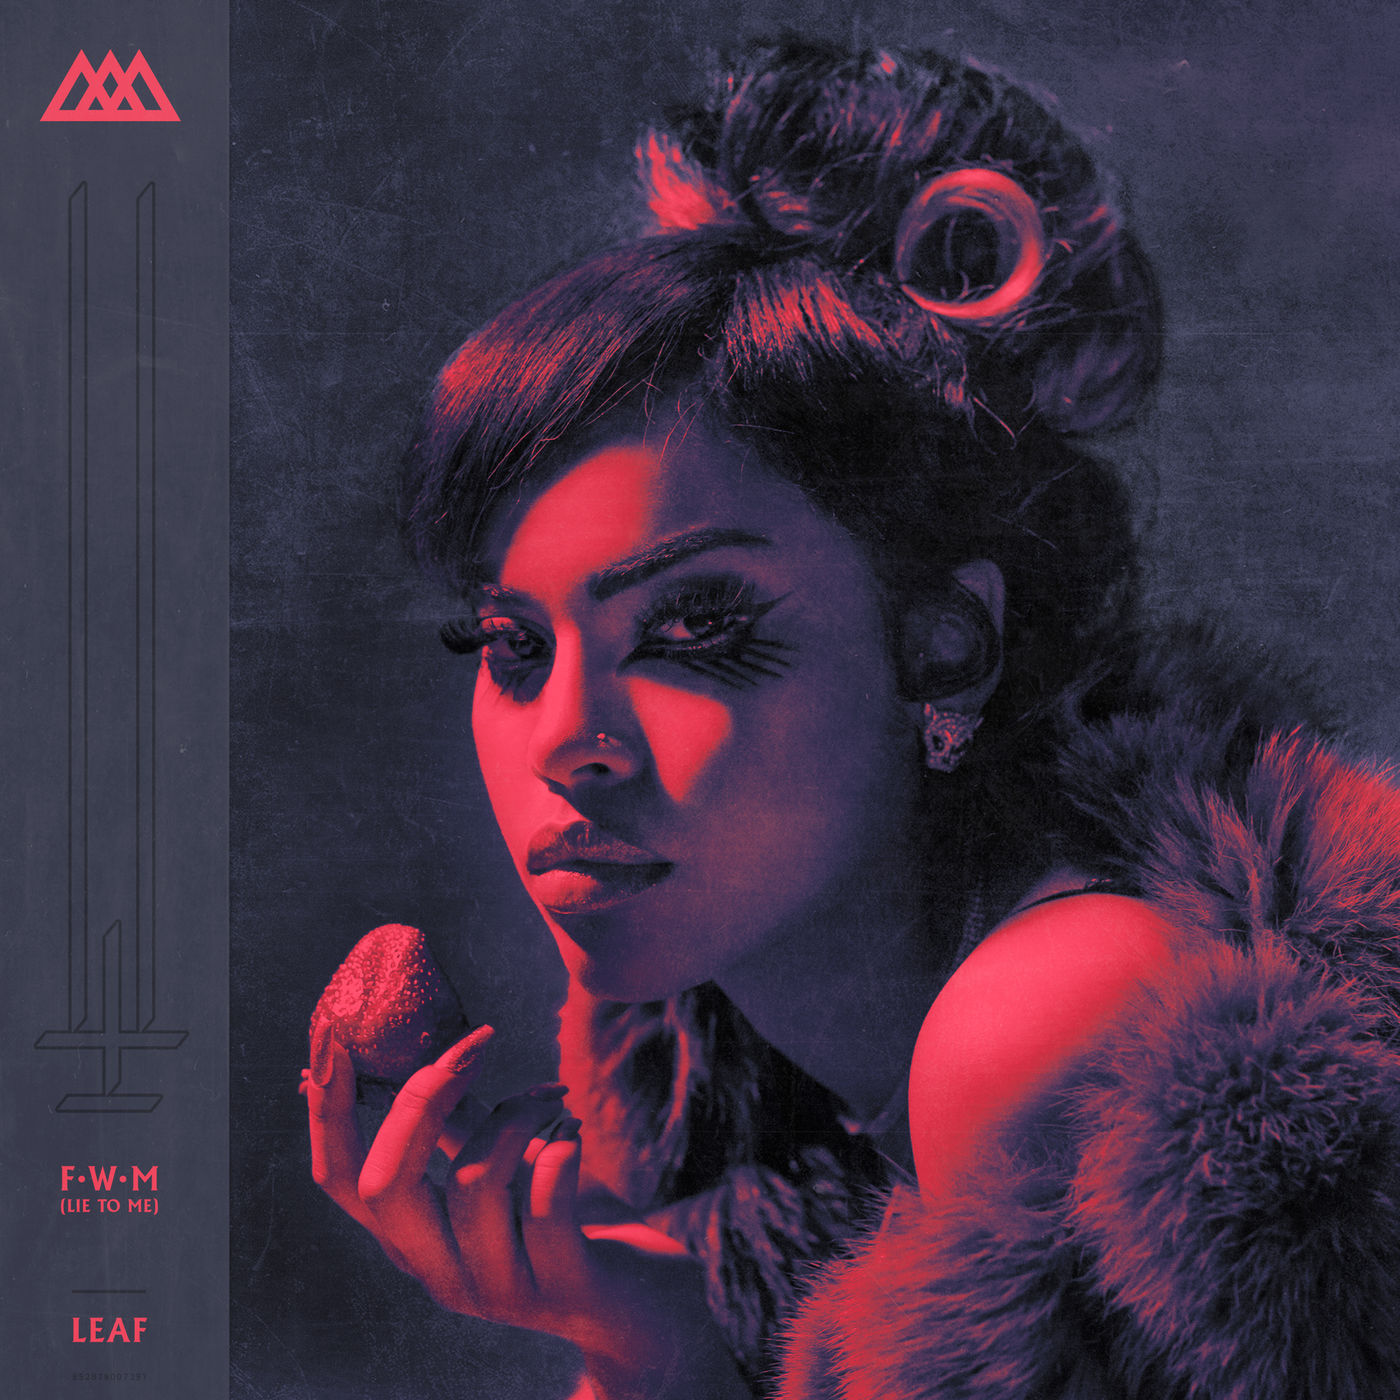 Leaf - FWM (Lie to Me) - Single Cover